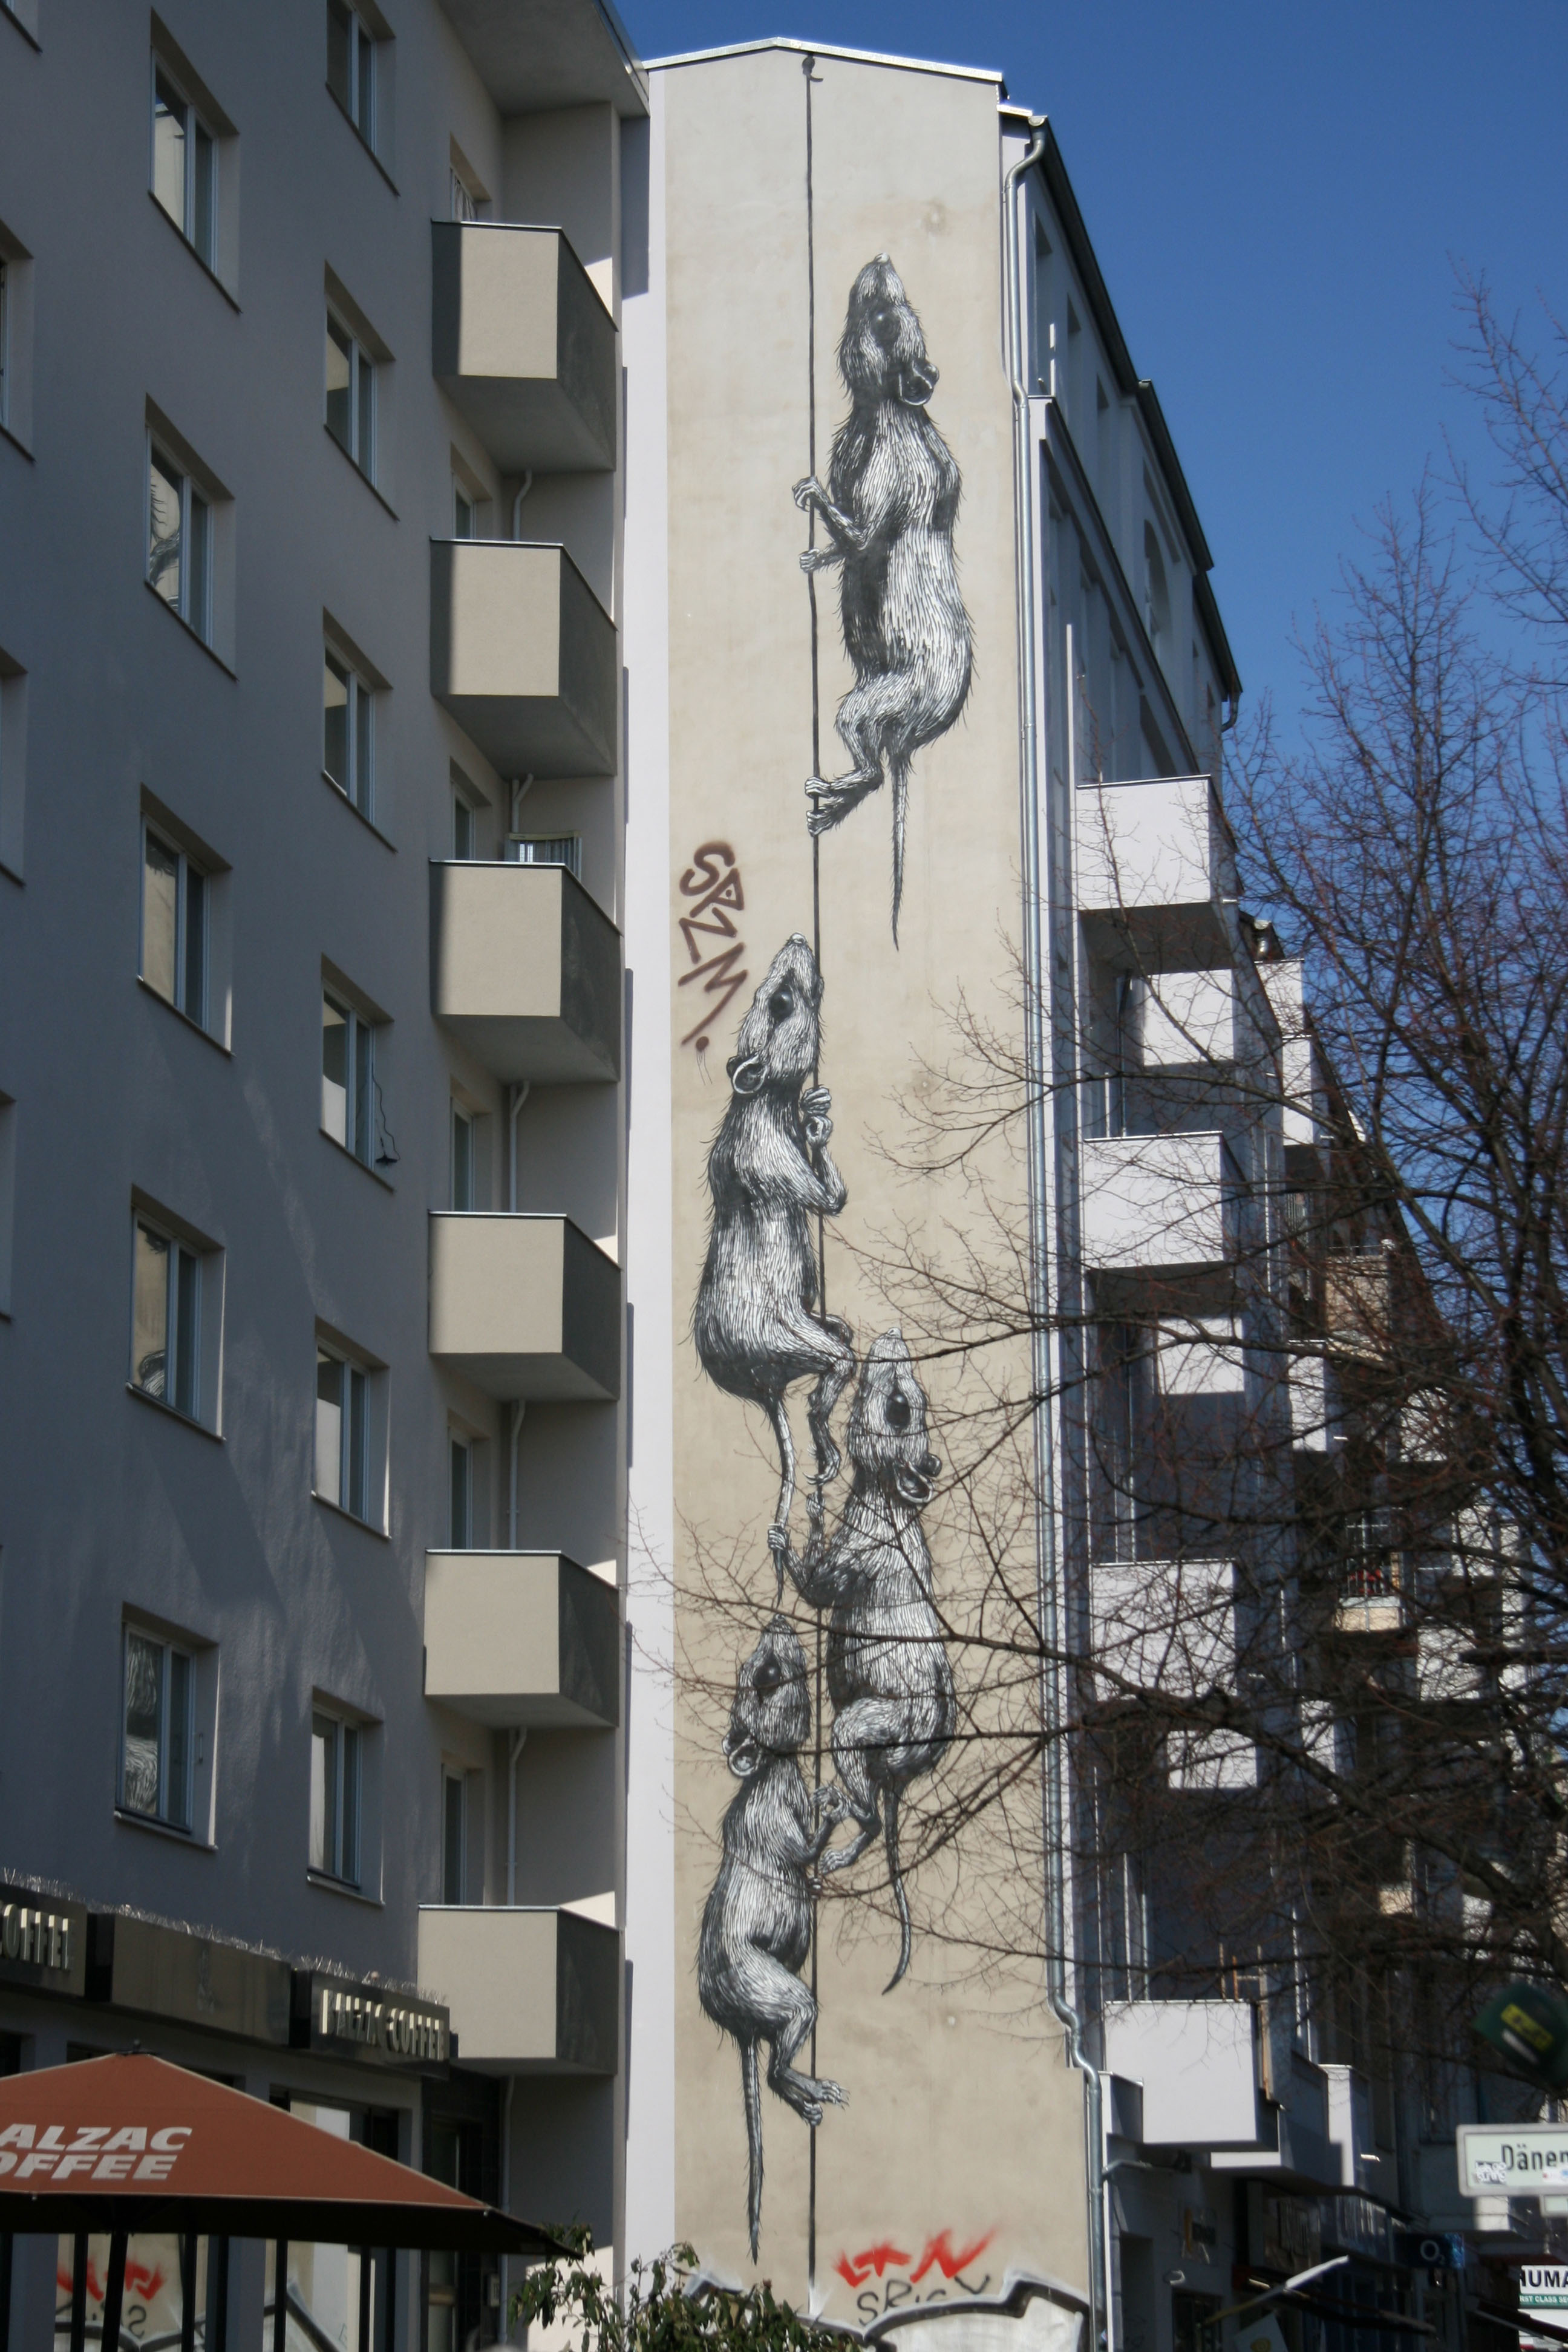 Rats: Street Art by ROA on the side of a building in Berlin's Prenzlauer Berg